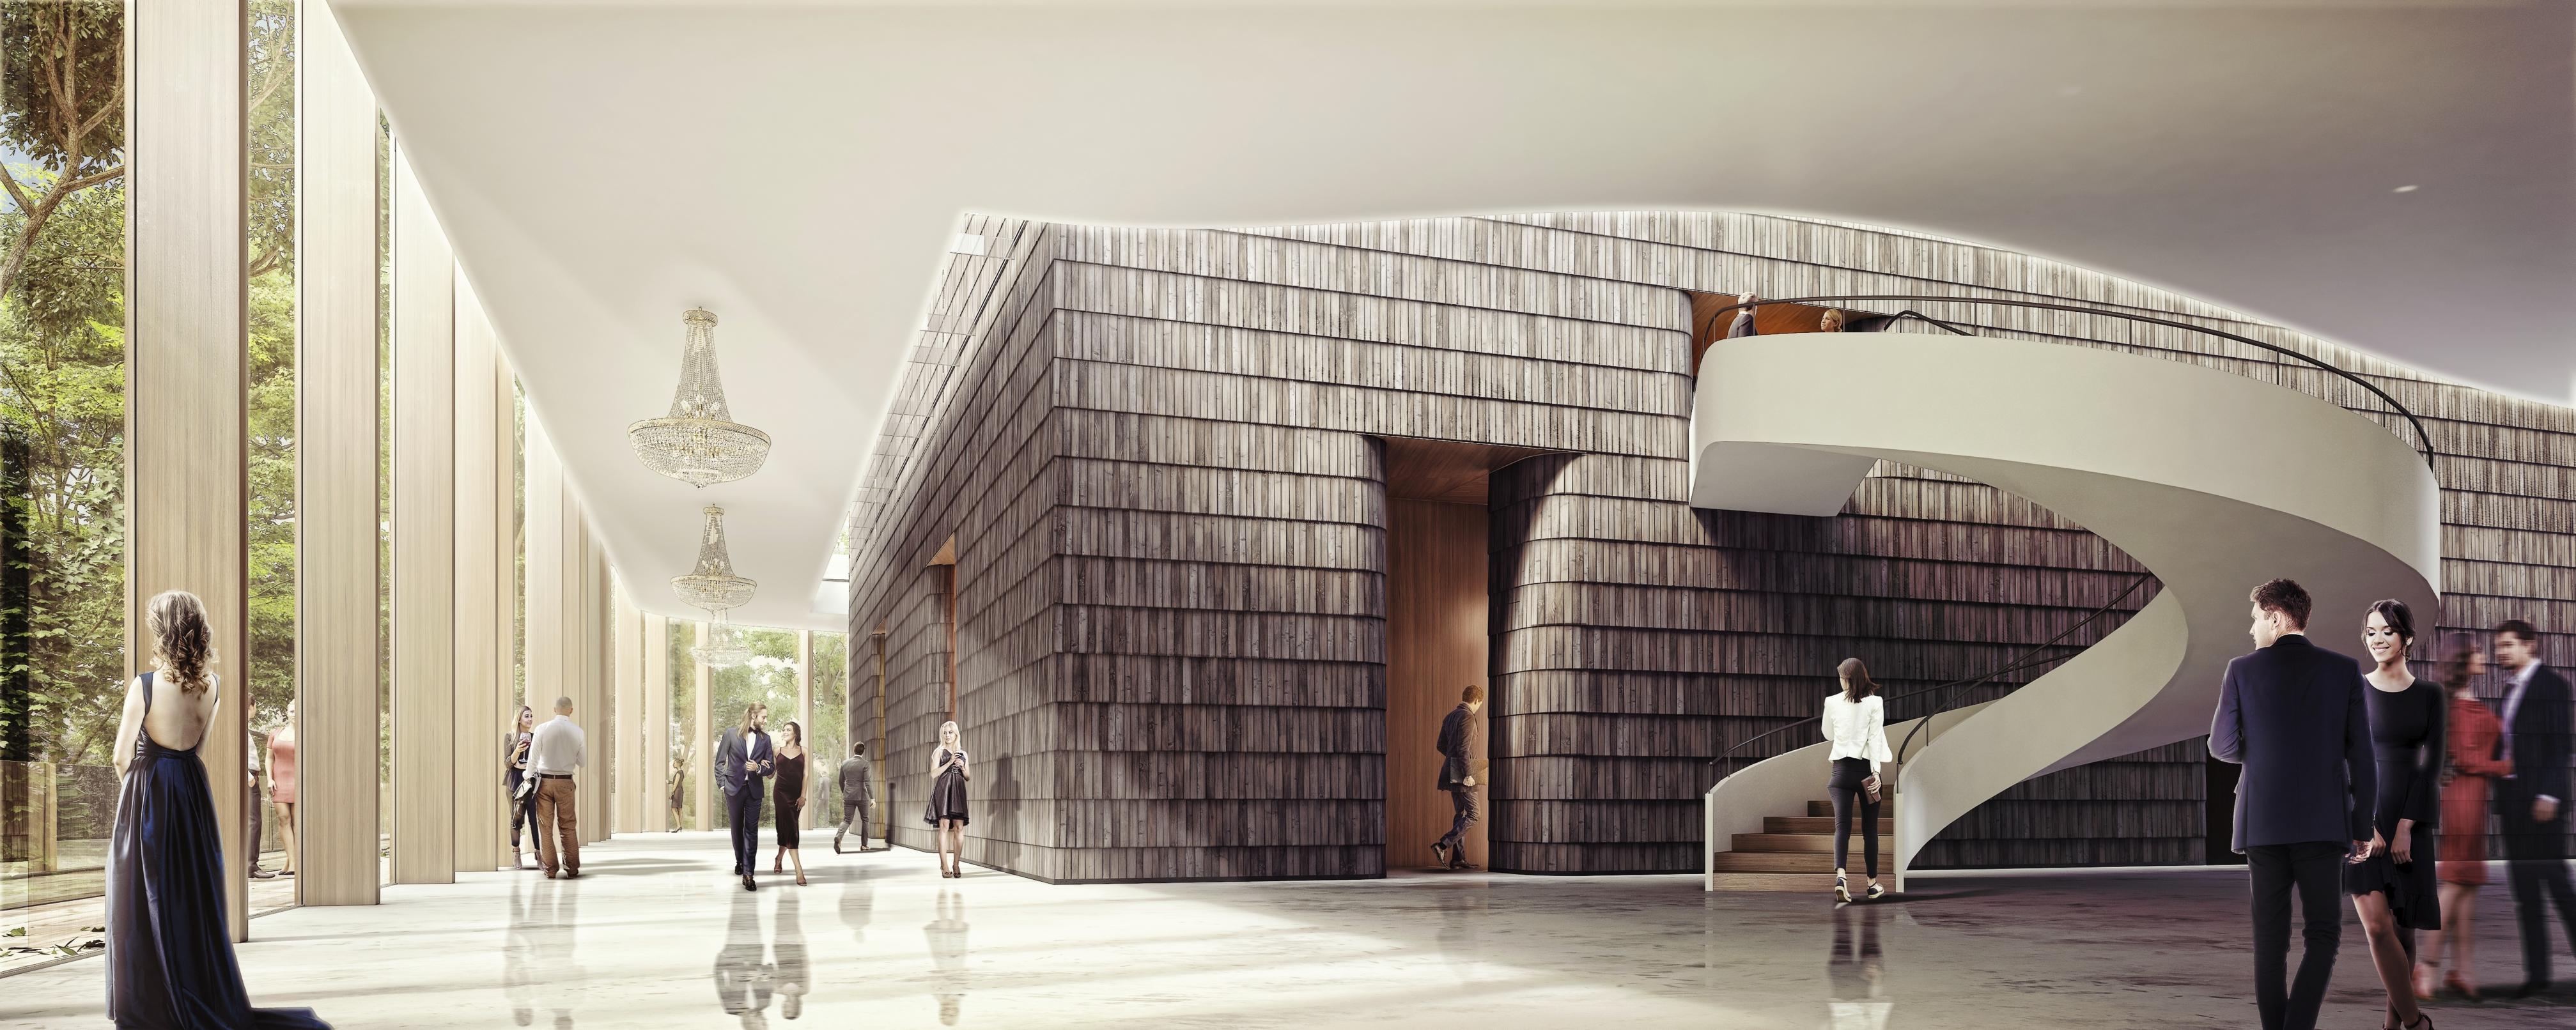 Chopin International Music Centre HRA Architekci 2018 foyer